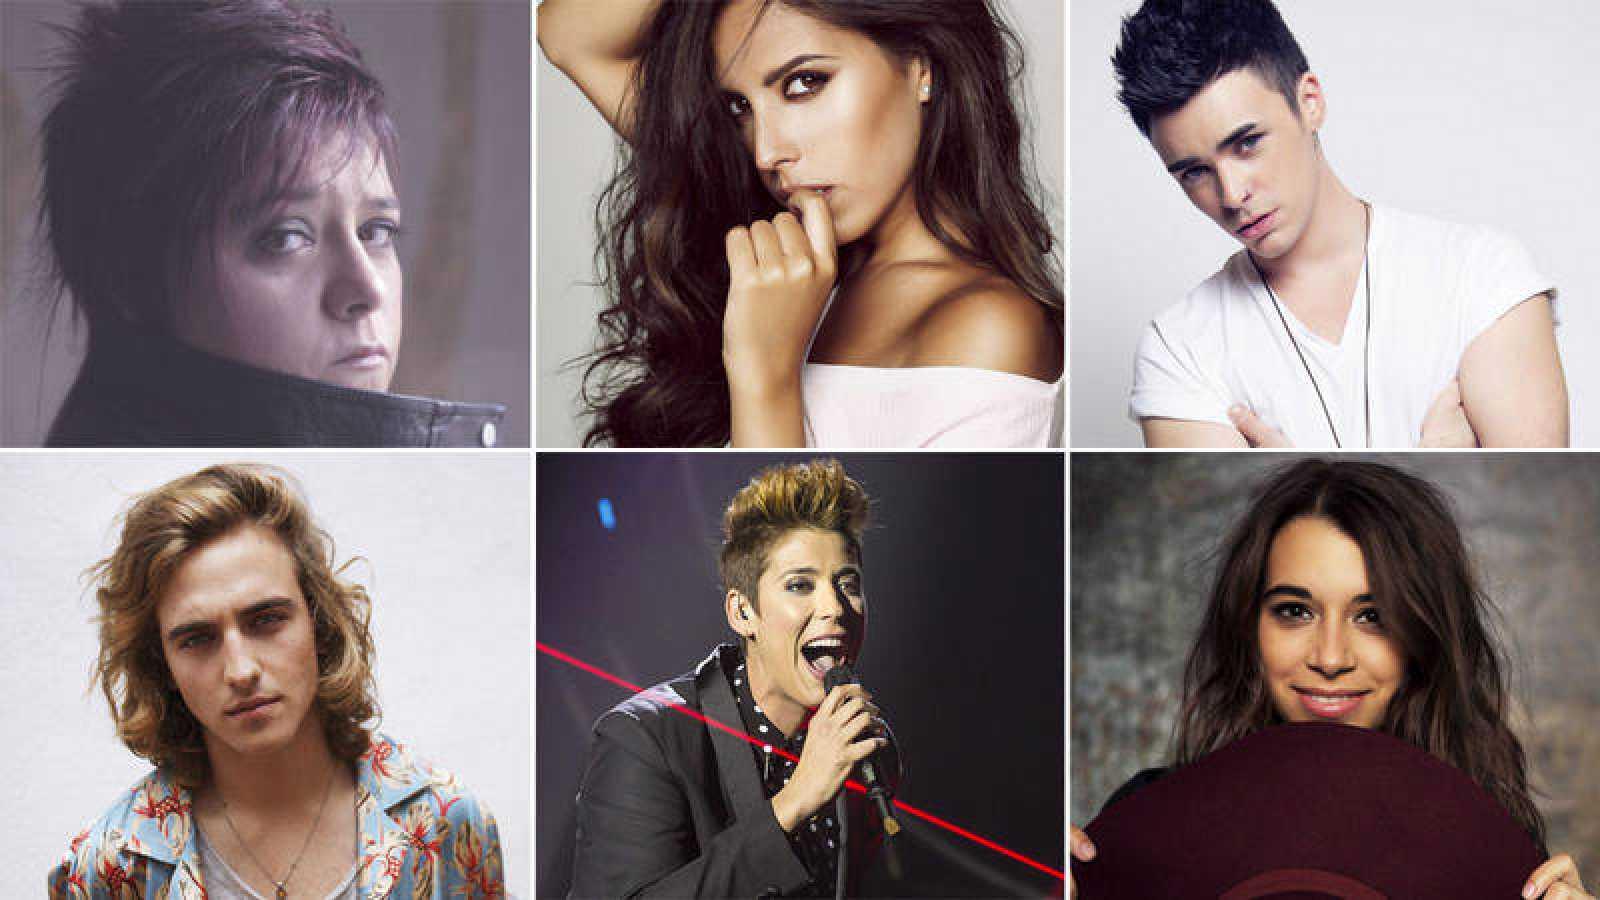 Las seis candidatos de 'Objetivo Eurovisión'